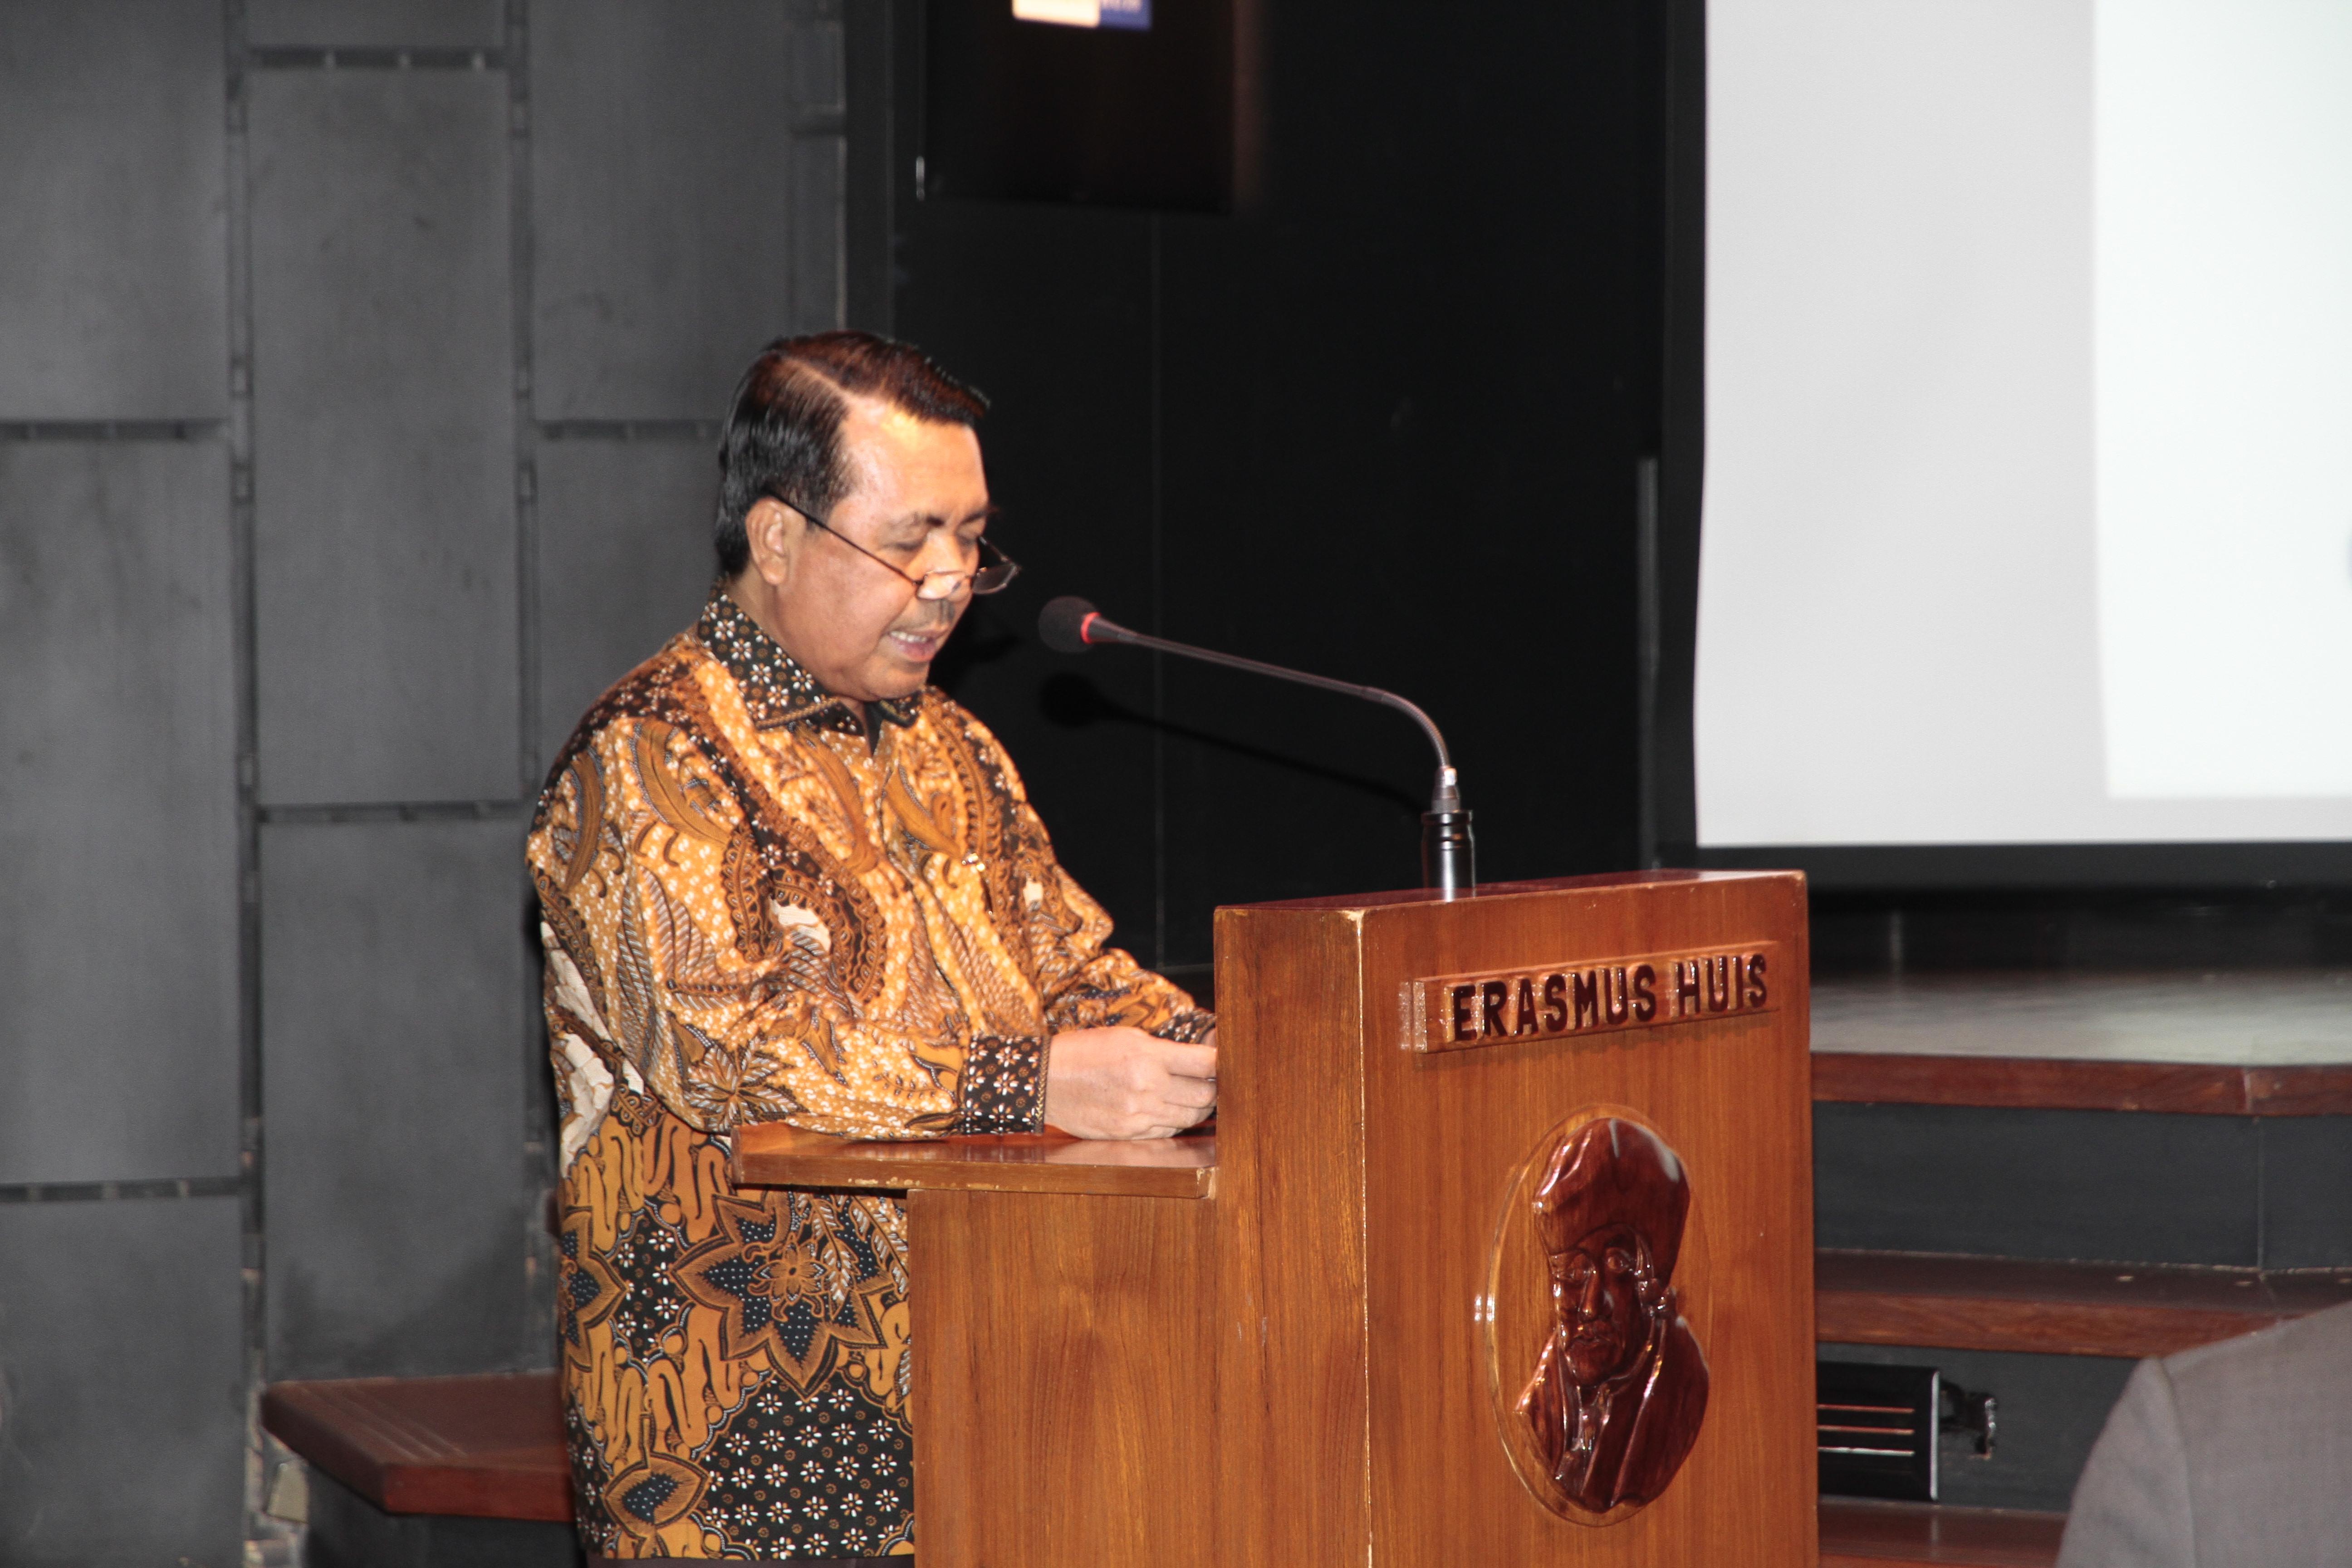 Dr. SYARIFUDDIN CERAMAH PADA KONFERENSI INDONESIA - NETHERLANDS SECURITY AND RULE OF LAW UPDATE 2019